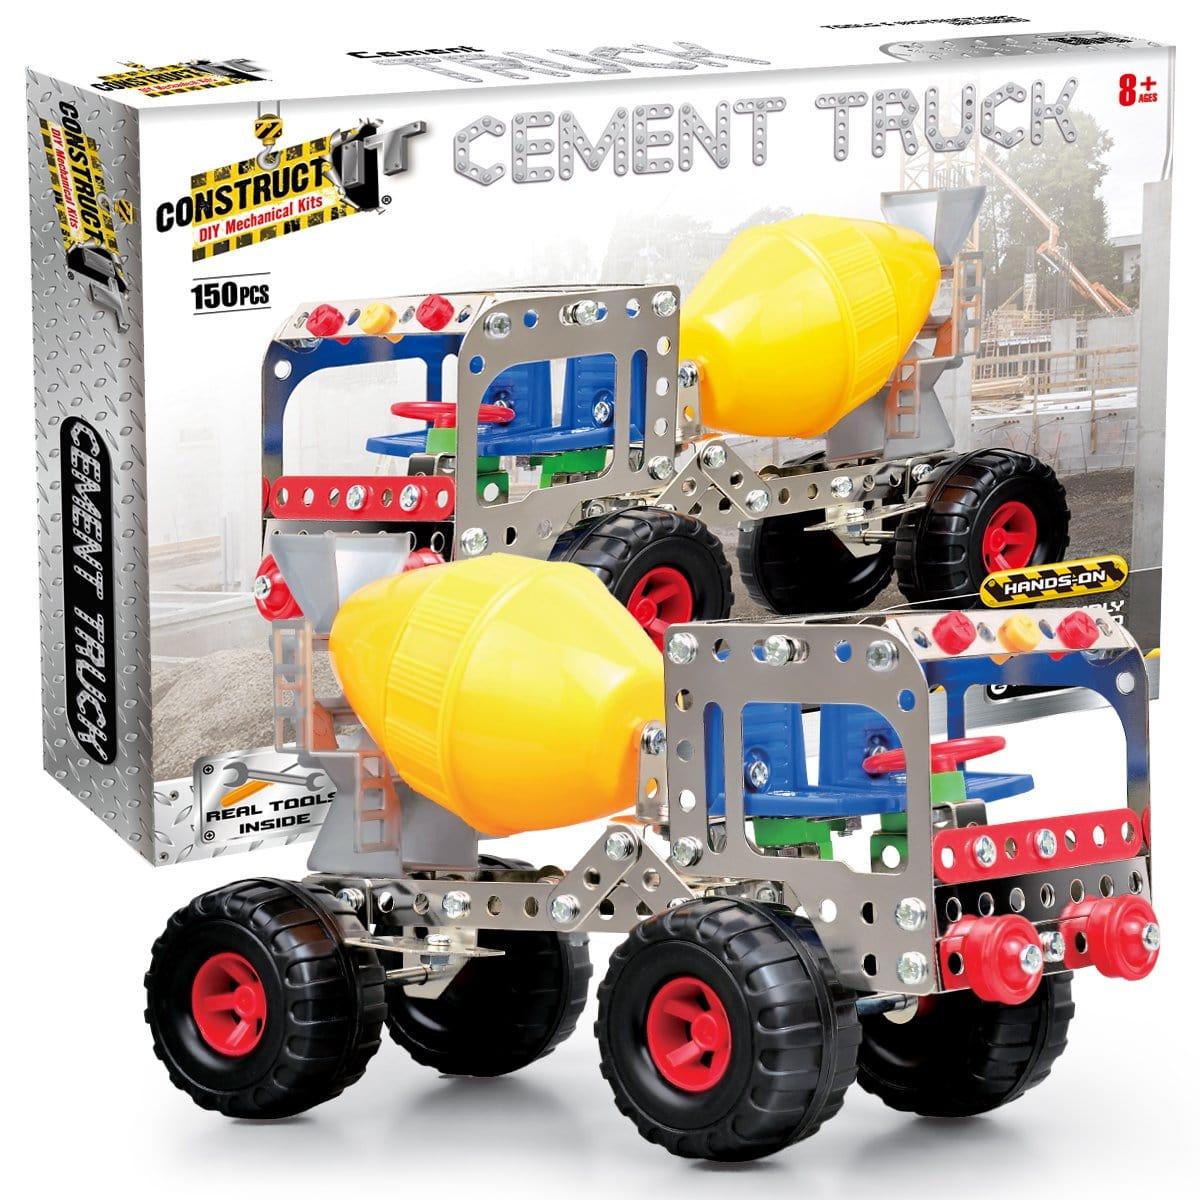 Construct-It! Cement Truck 150 Piece Kit